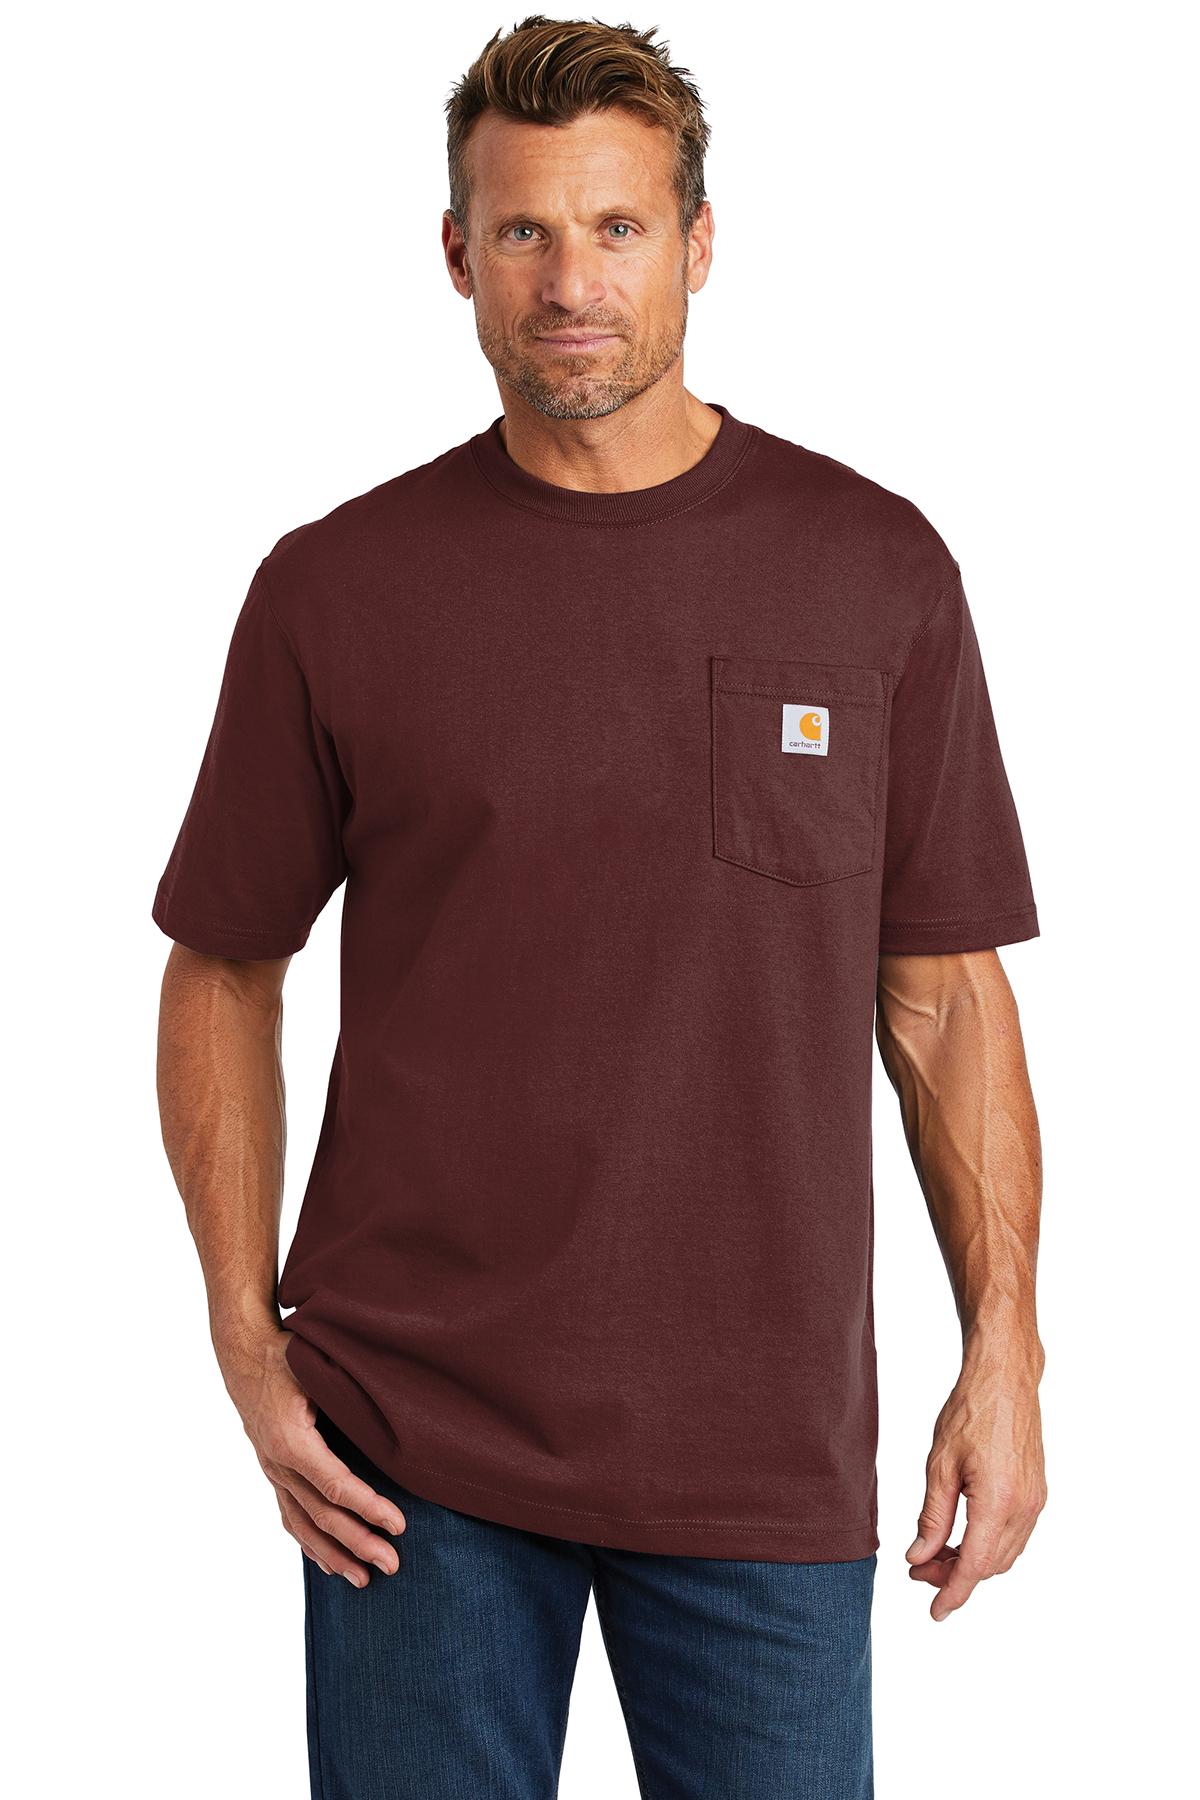 Carhartt® CTK87 - Workwear Pocket Short Sleeve ...